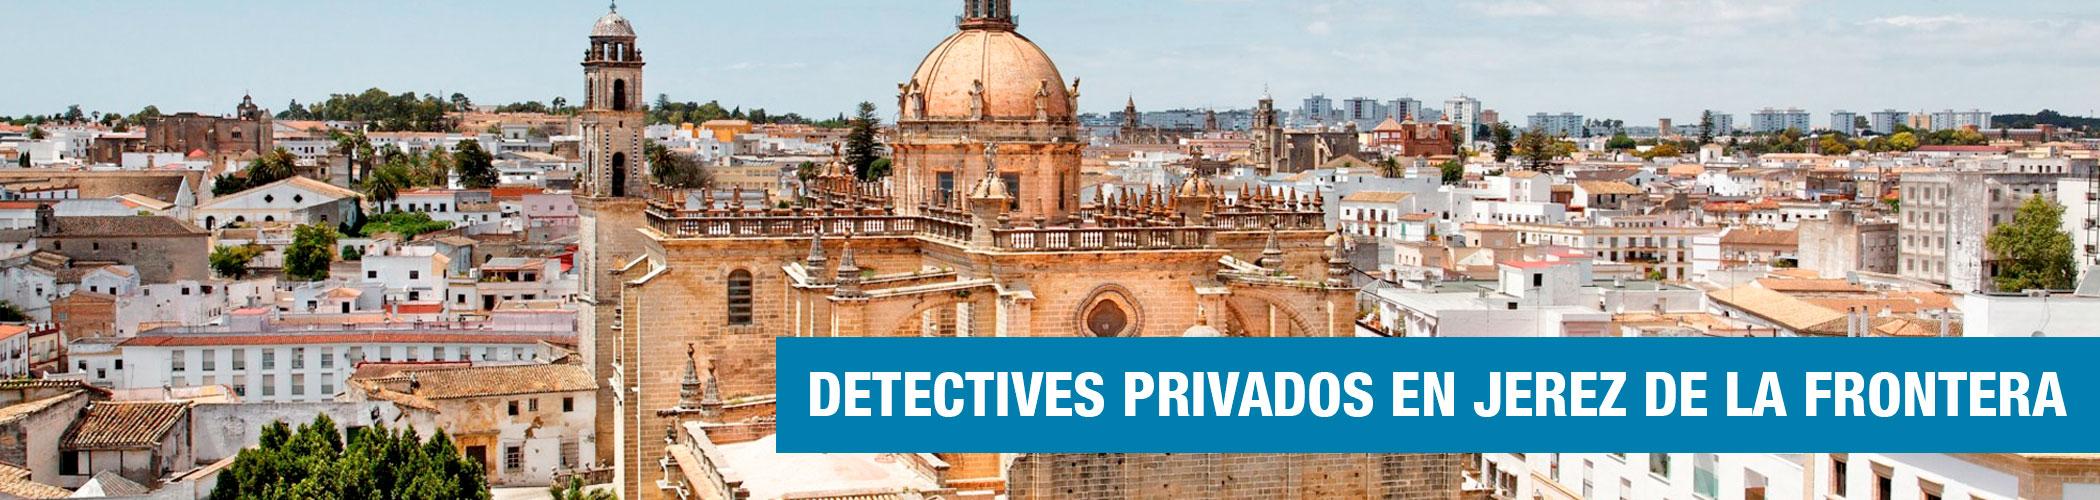 Detectives en Jerez de la Frontera